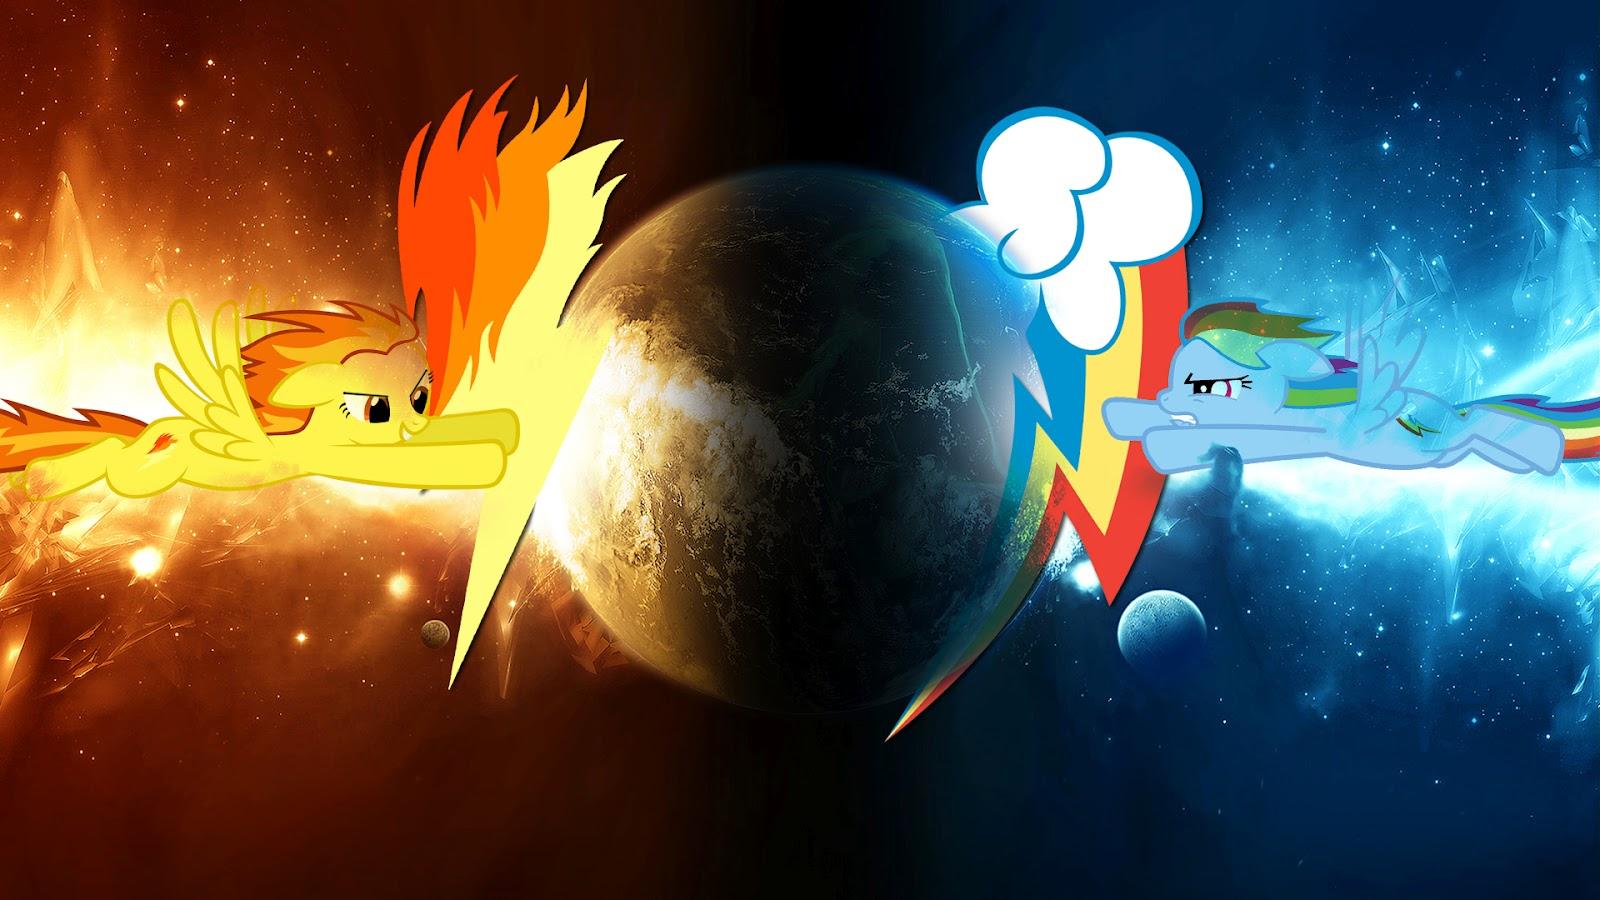 http://1.bp.blogspot.com/-1y89ZHrTGSo/UAx_Ku1XrkI/AAAAAAAAALk/9t2a8Pogk5E/s1600/spitfire+and+rainbow+dash.jpg